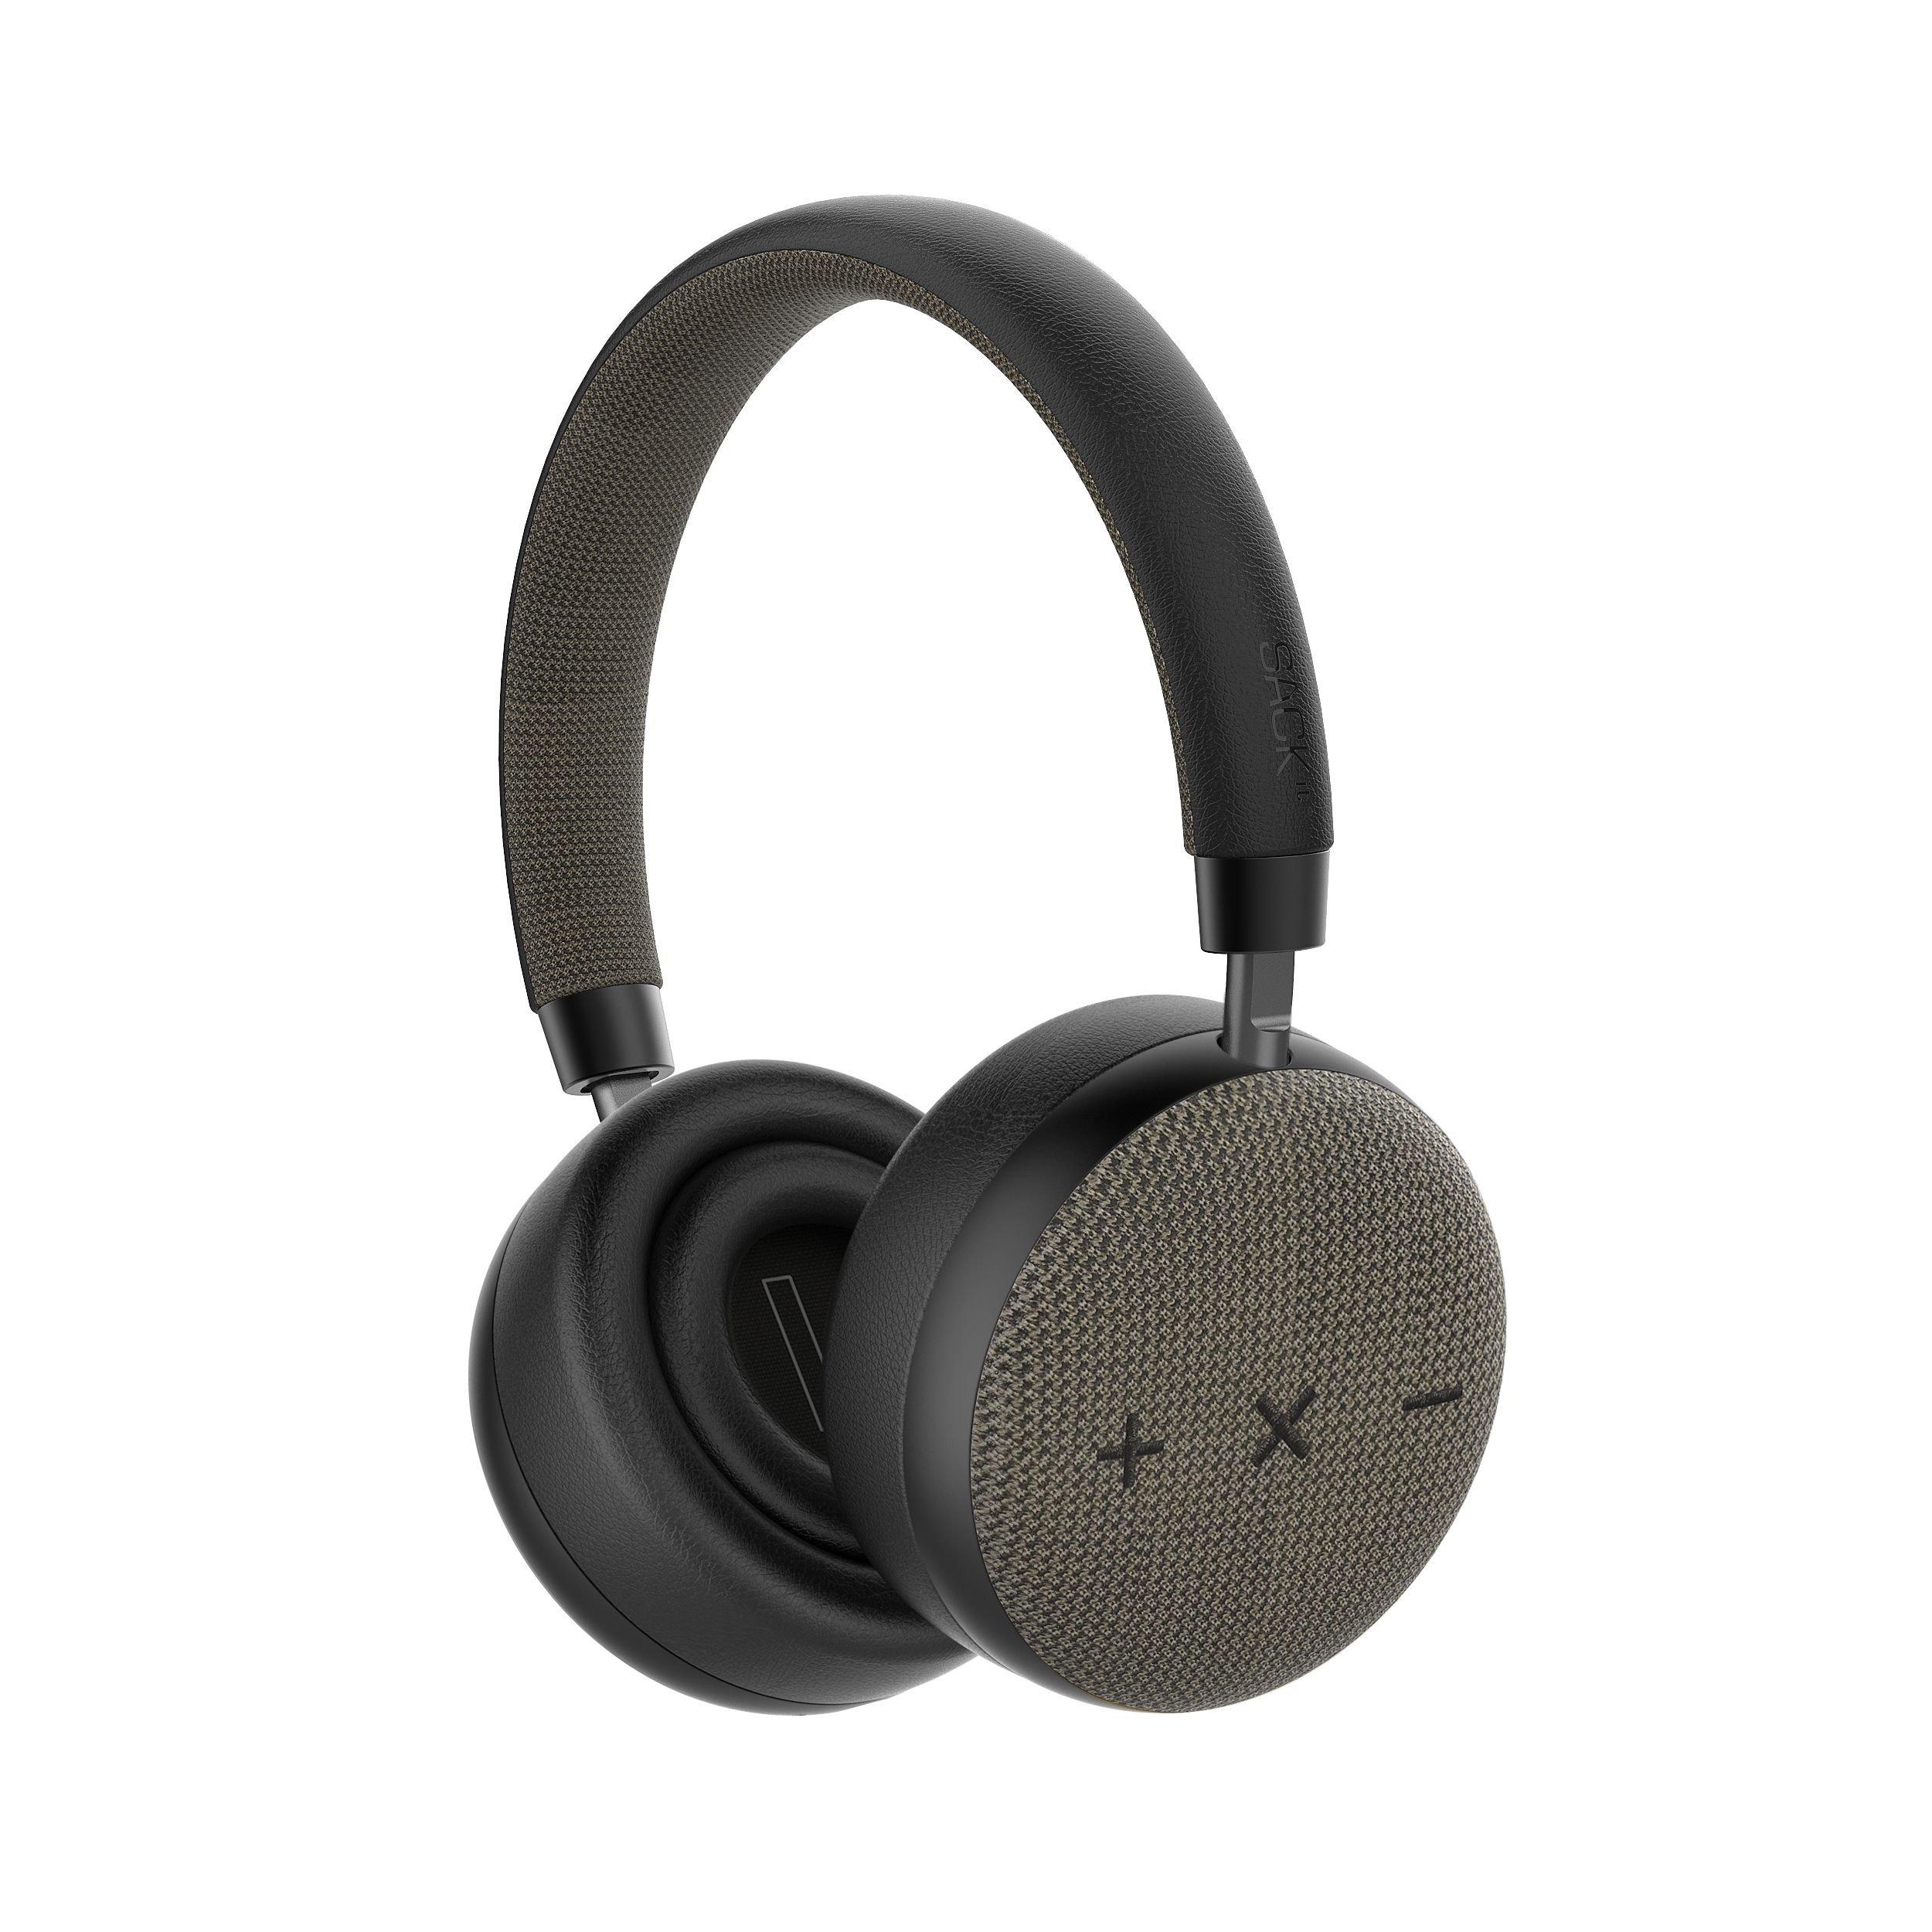 SACKit - TOUCHit S On-Ear Headphones - Black